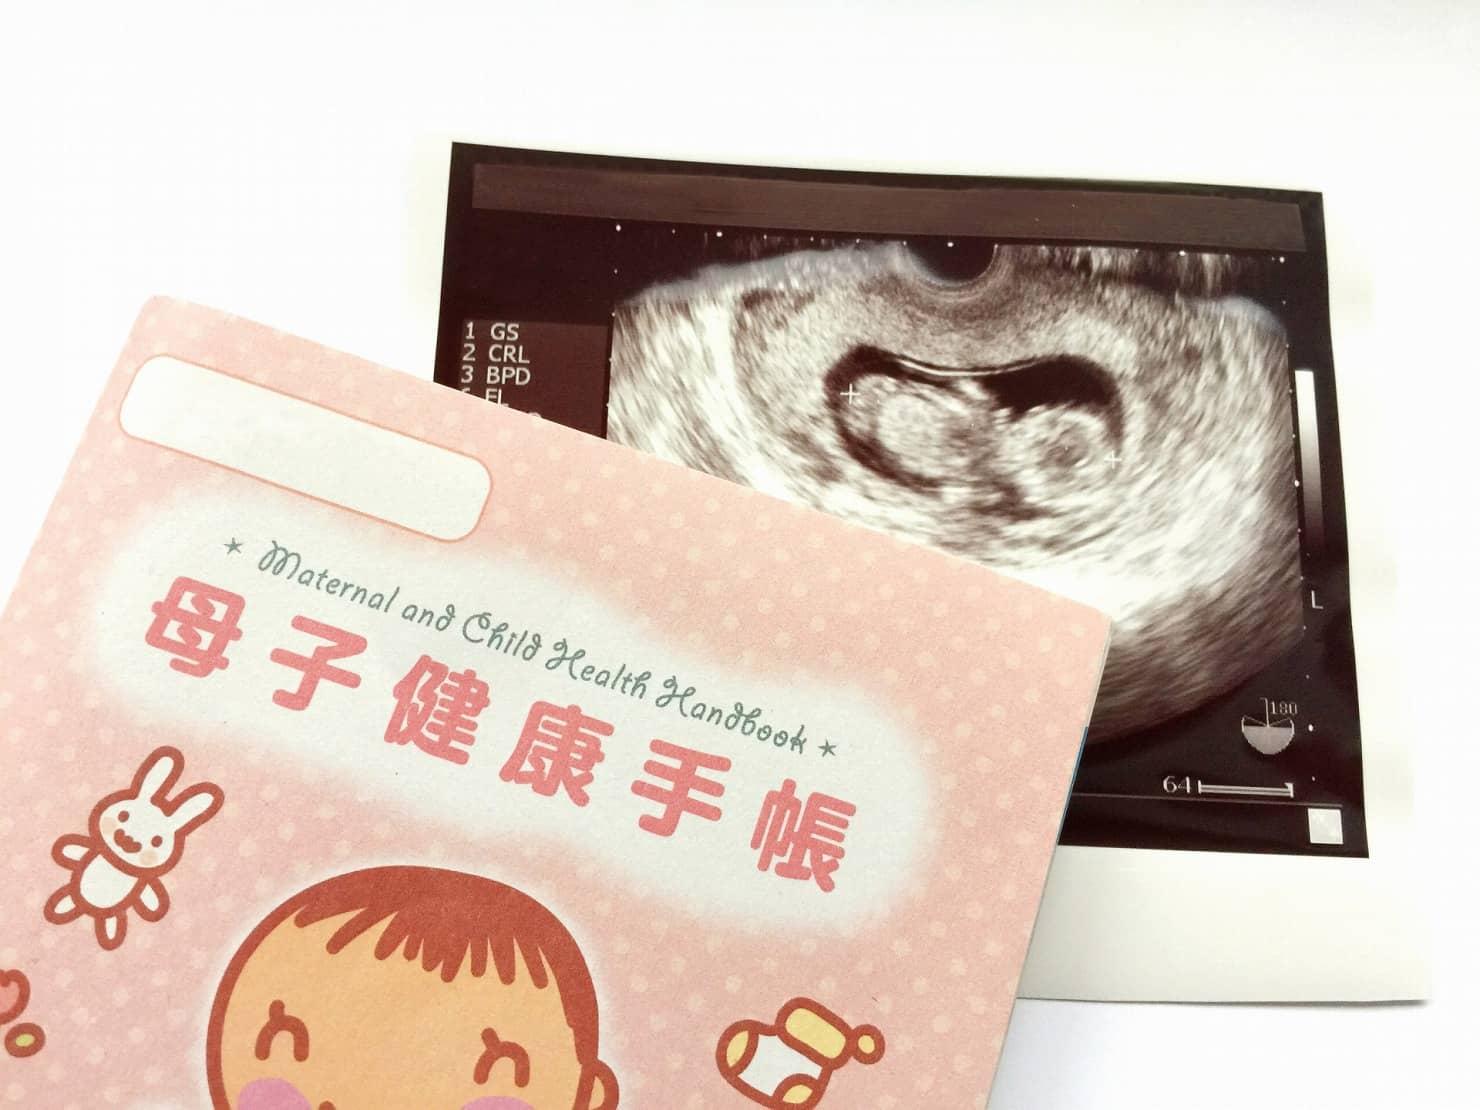 【FP監修・令和2年版】妊娠出産や不妊治療費も対象になる?  医療費控除を詳しく解説